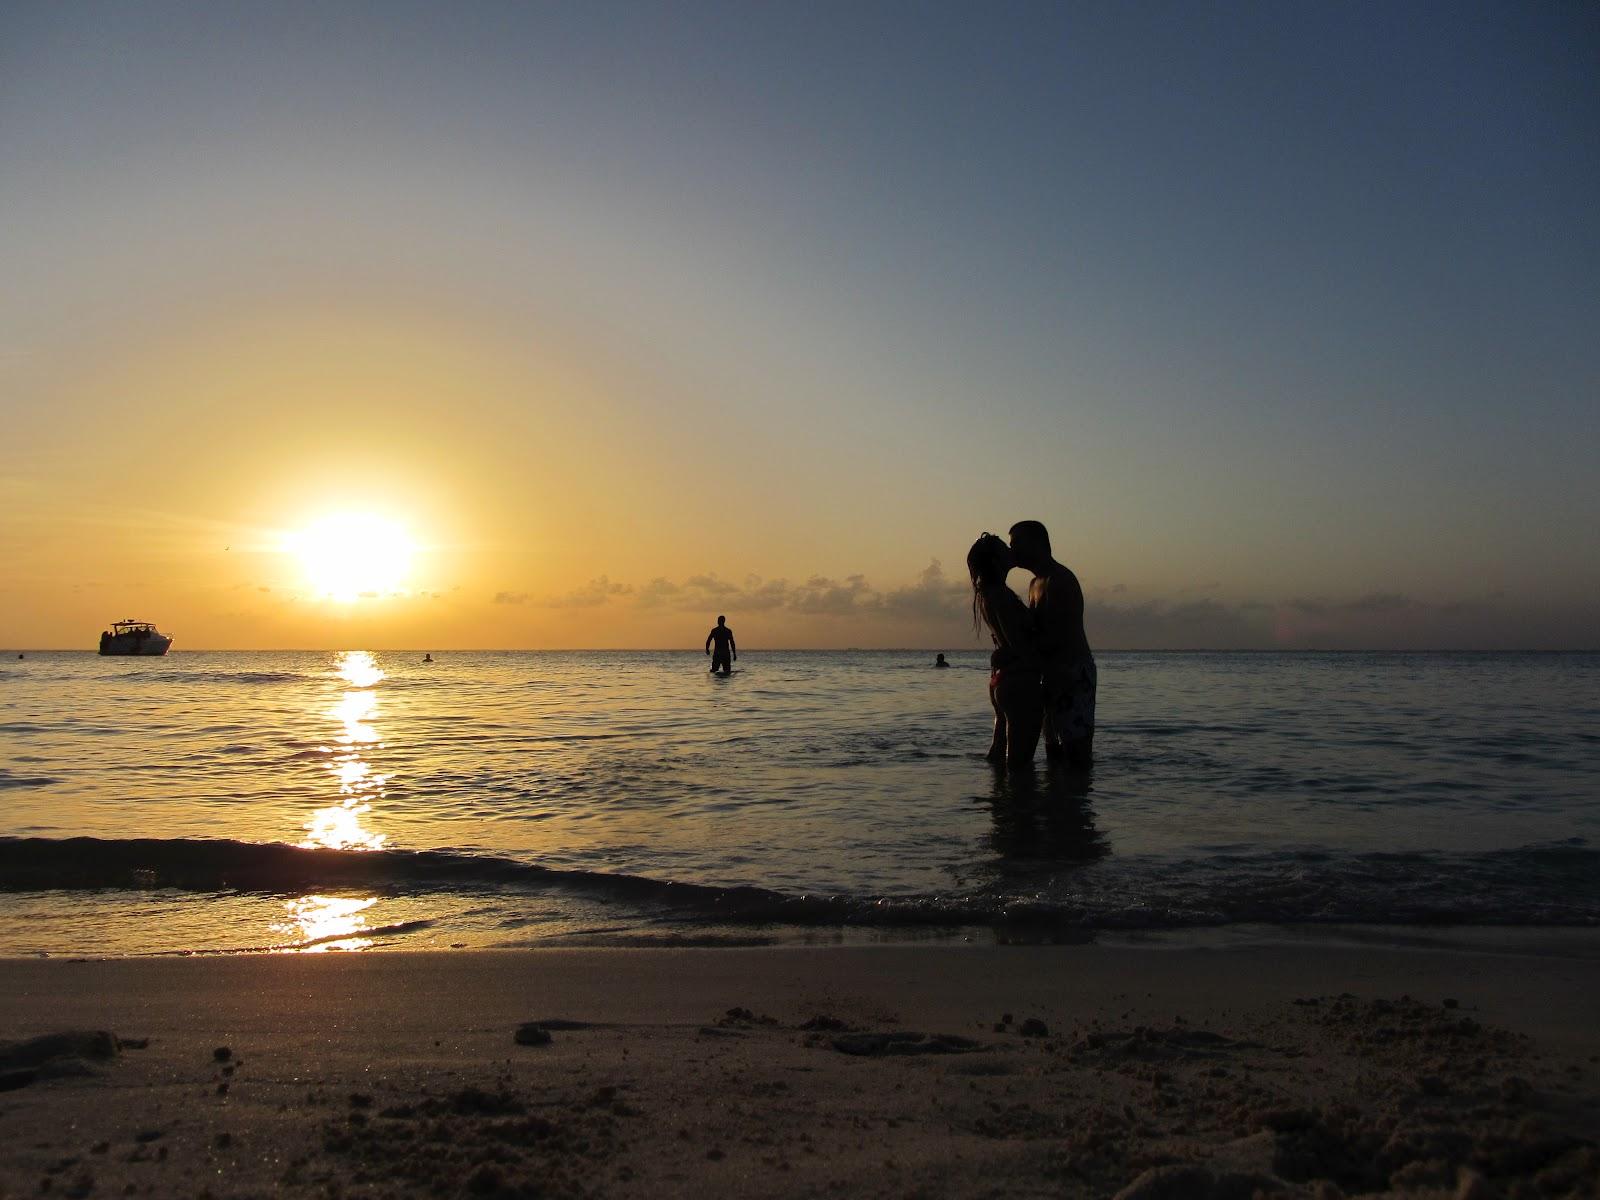 Desfrutar das magníficas praias com água e o sol na ISLA MUJERES | México